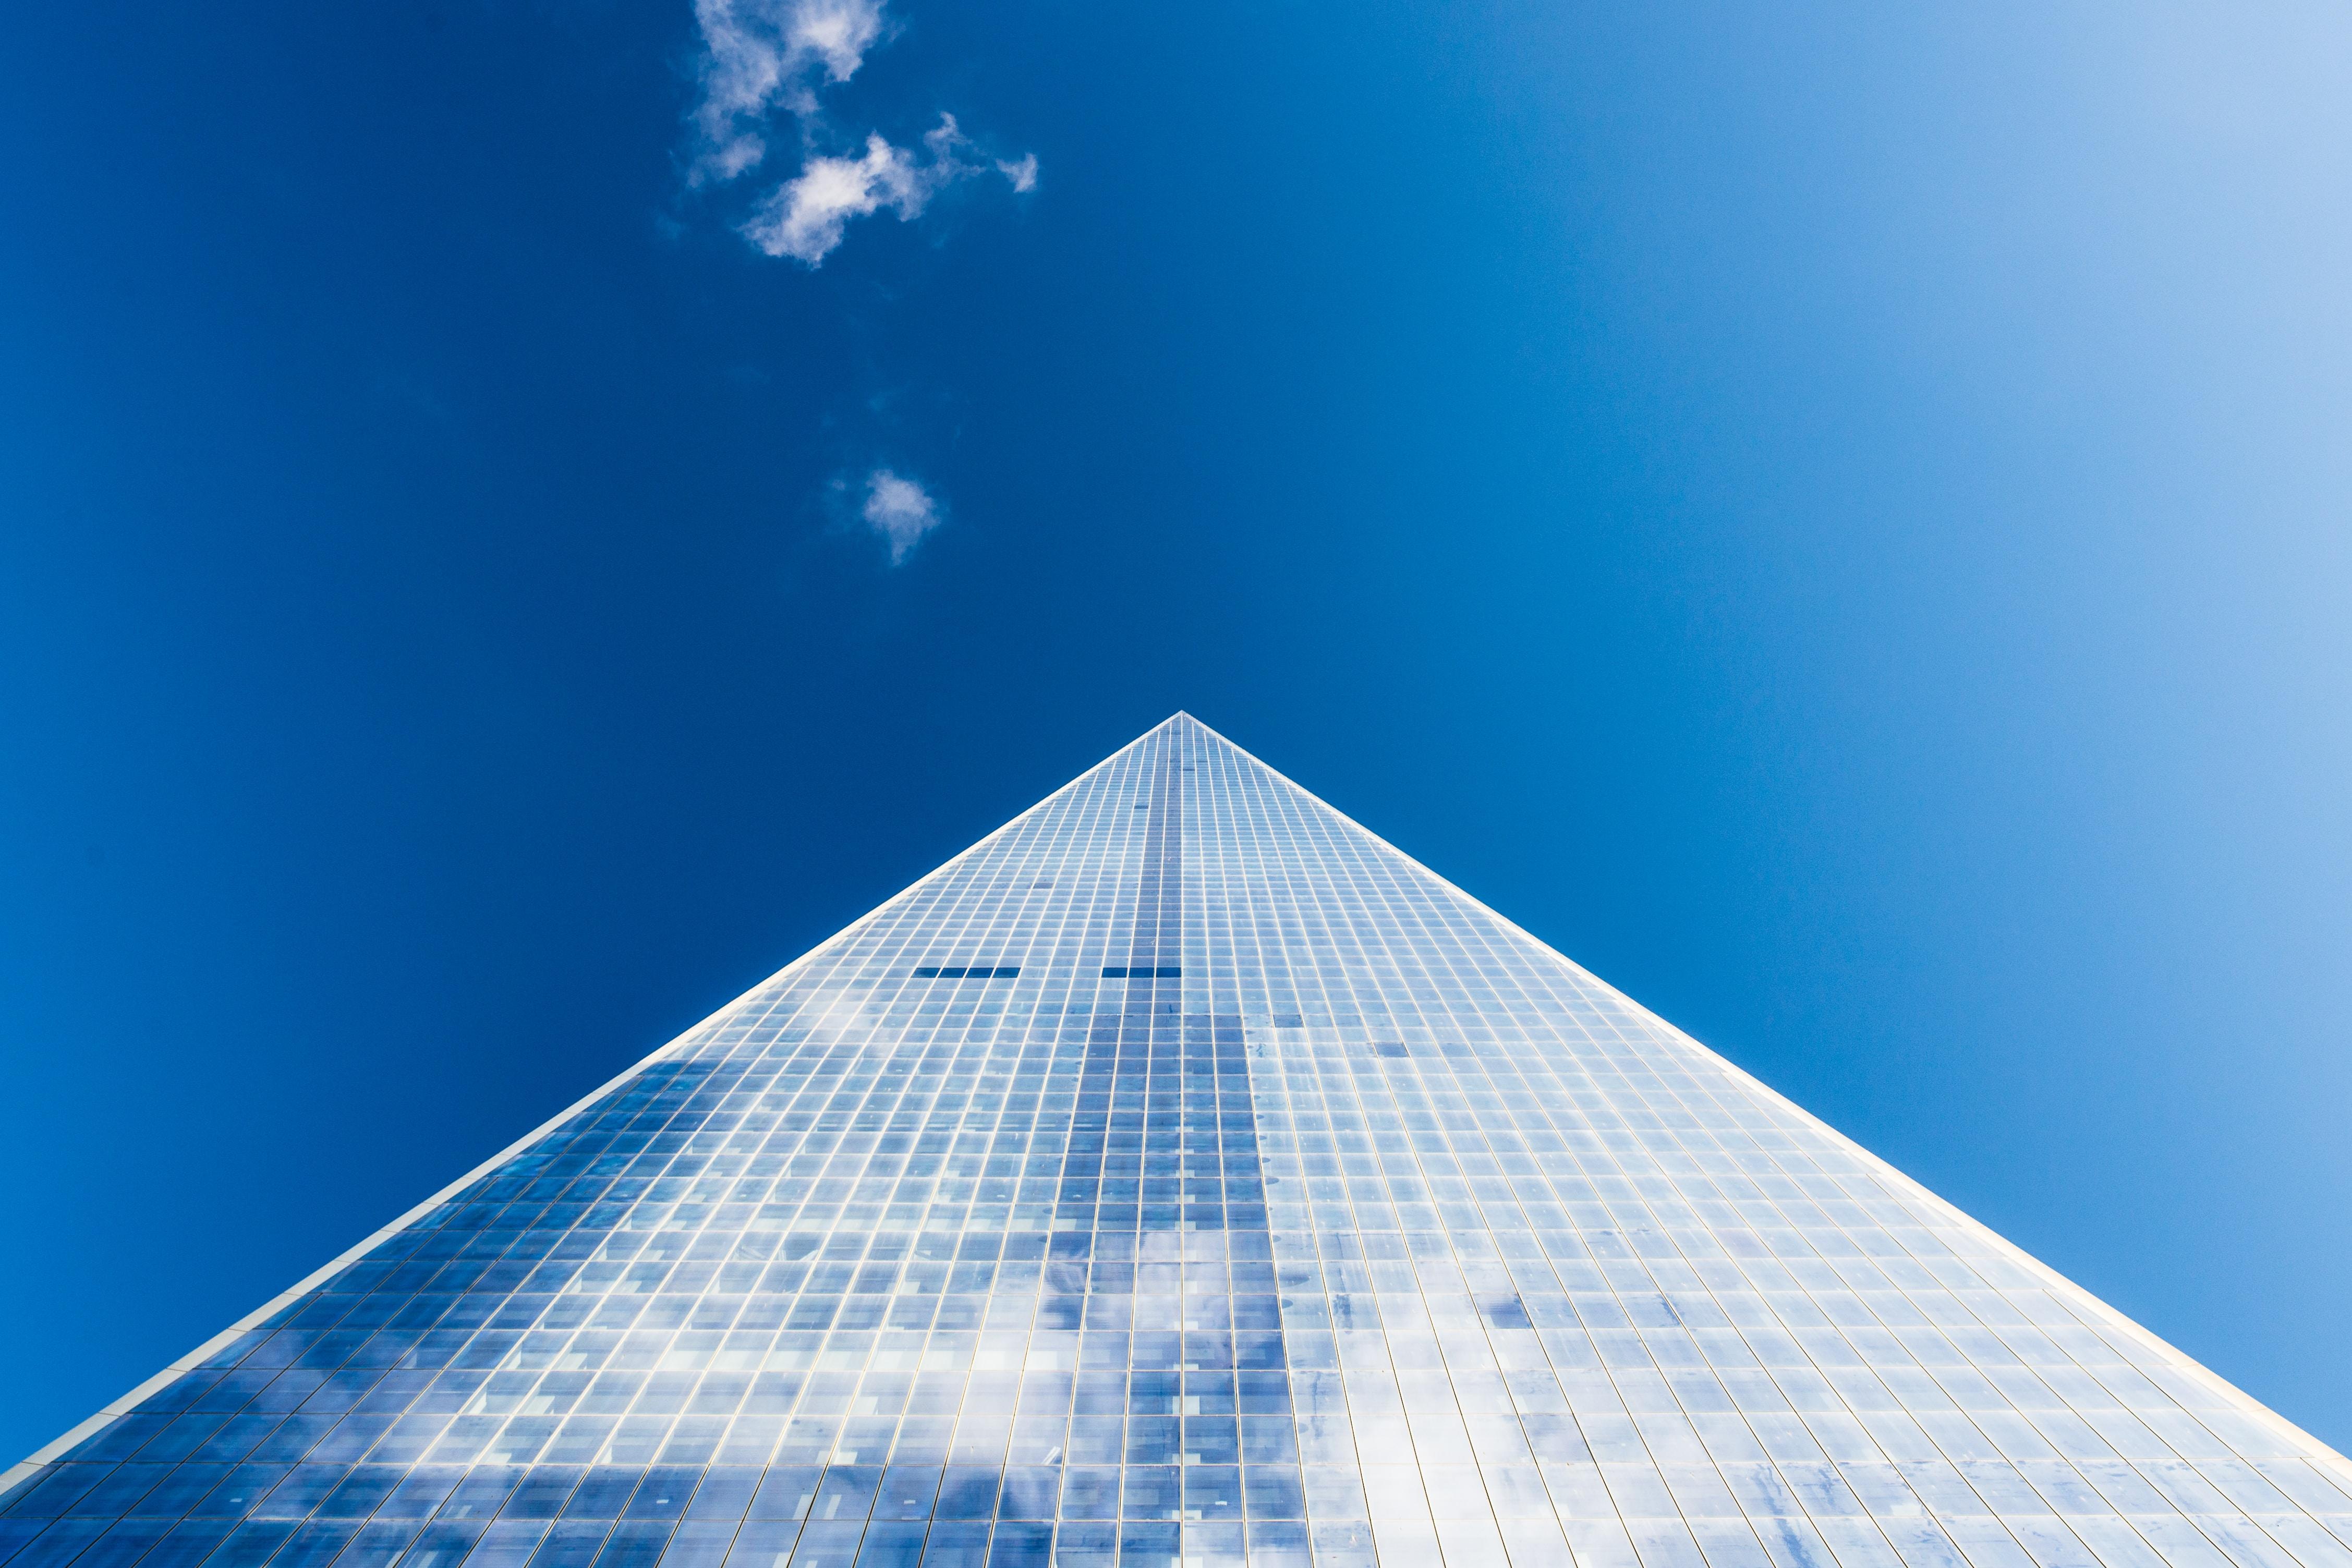 A vertical view of a building upwards towards a blue sky